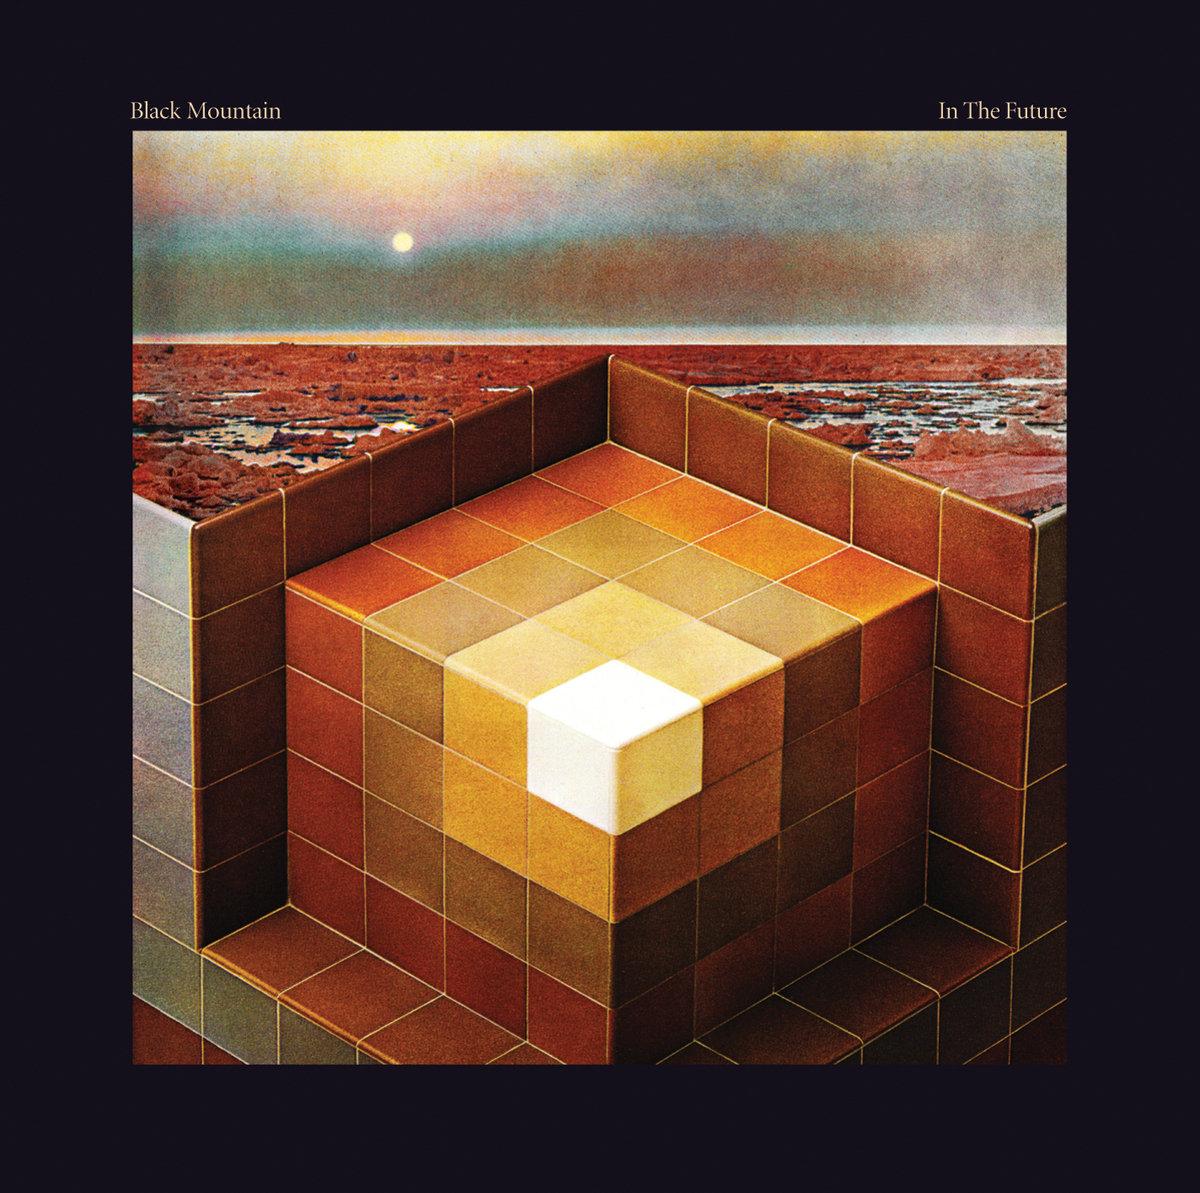 BLACK MOUNTAIN  In the Future, 2008, Self-Produced, 57:03